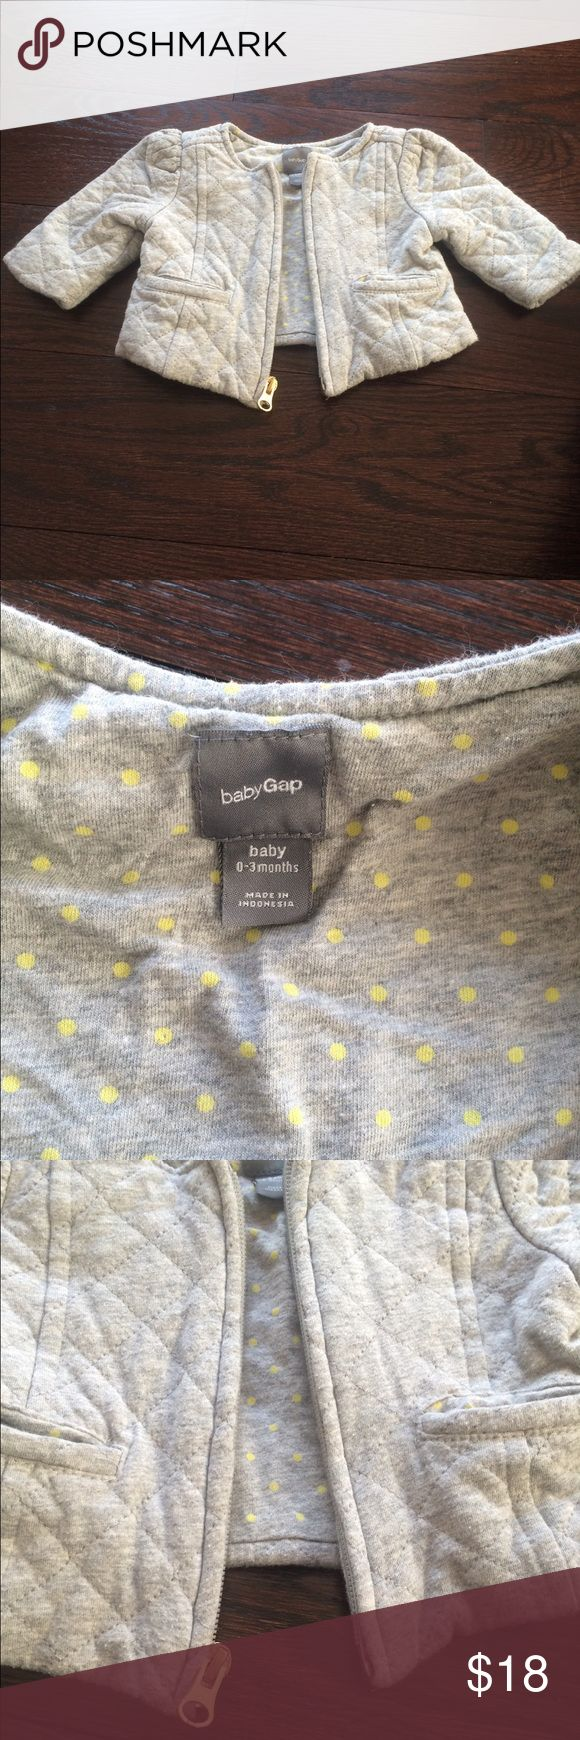 Gap jacket Gap jacket, size 0-3 months, grey color GAP Jackets & Coats